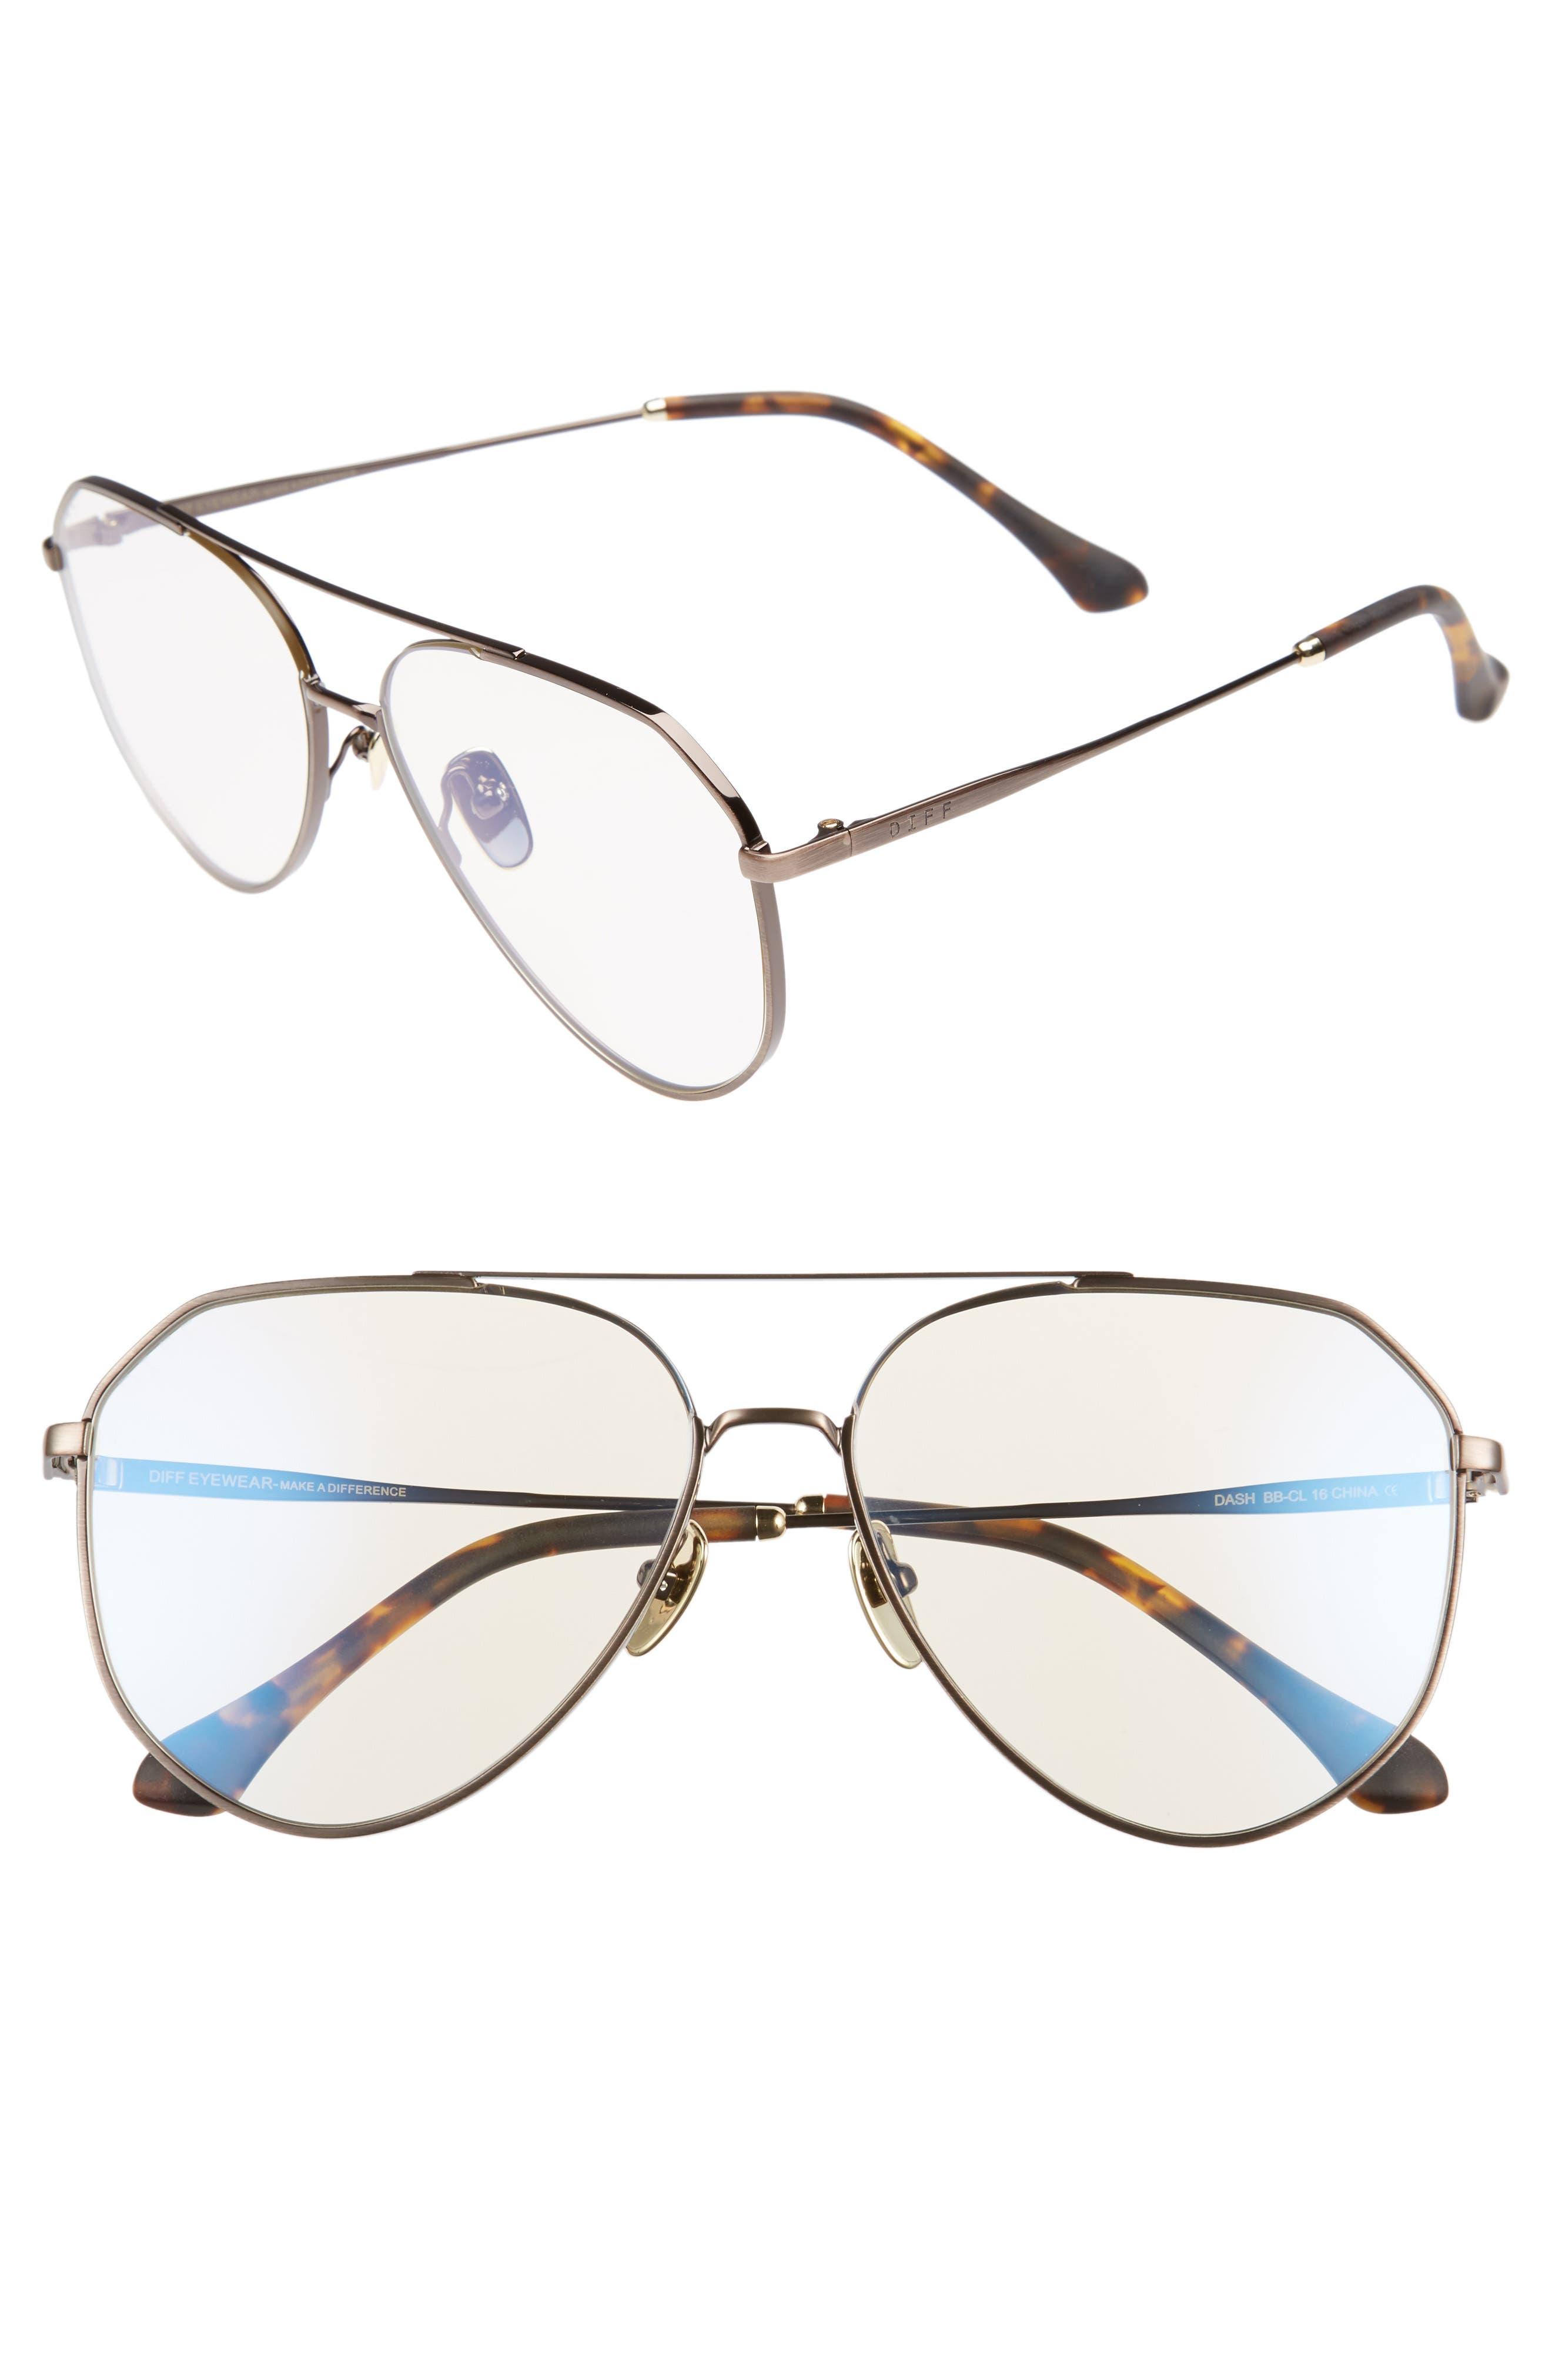 Dash 61mm Aviator Sunglasses,                         Main,                         color, Brown/ Clear